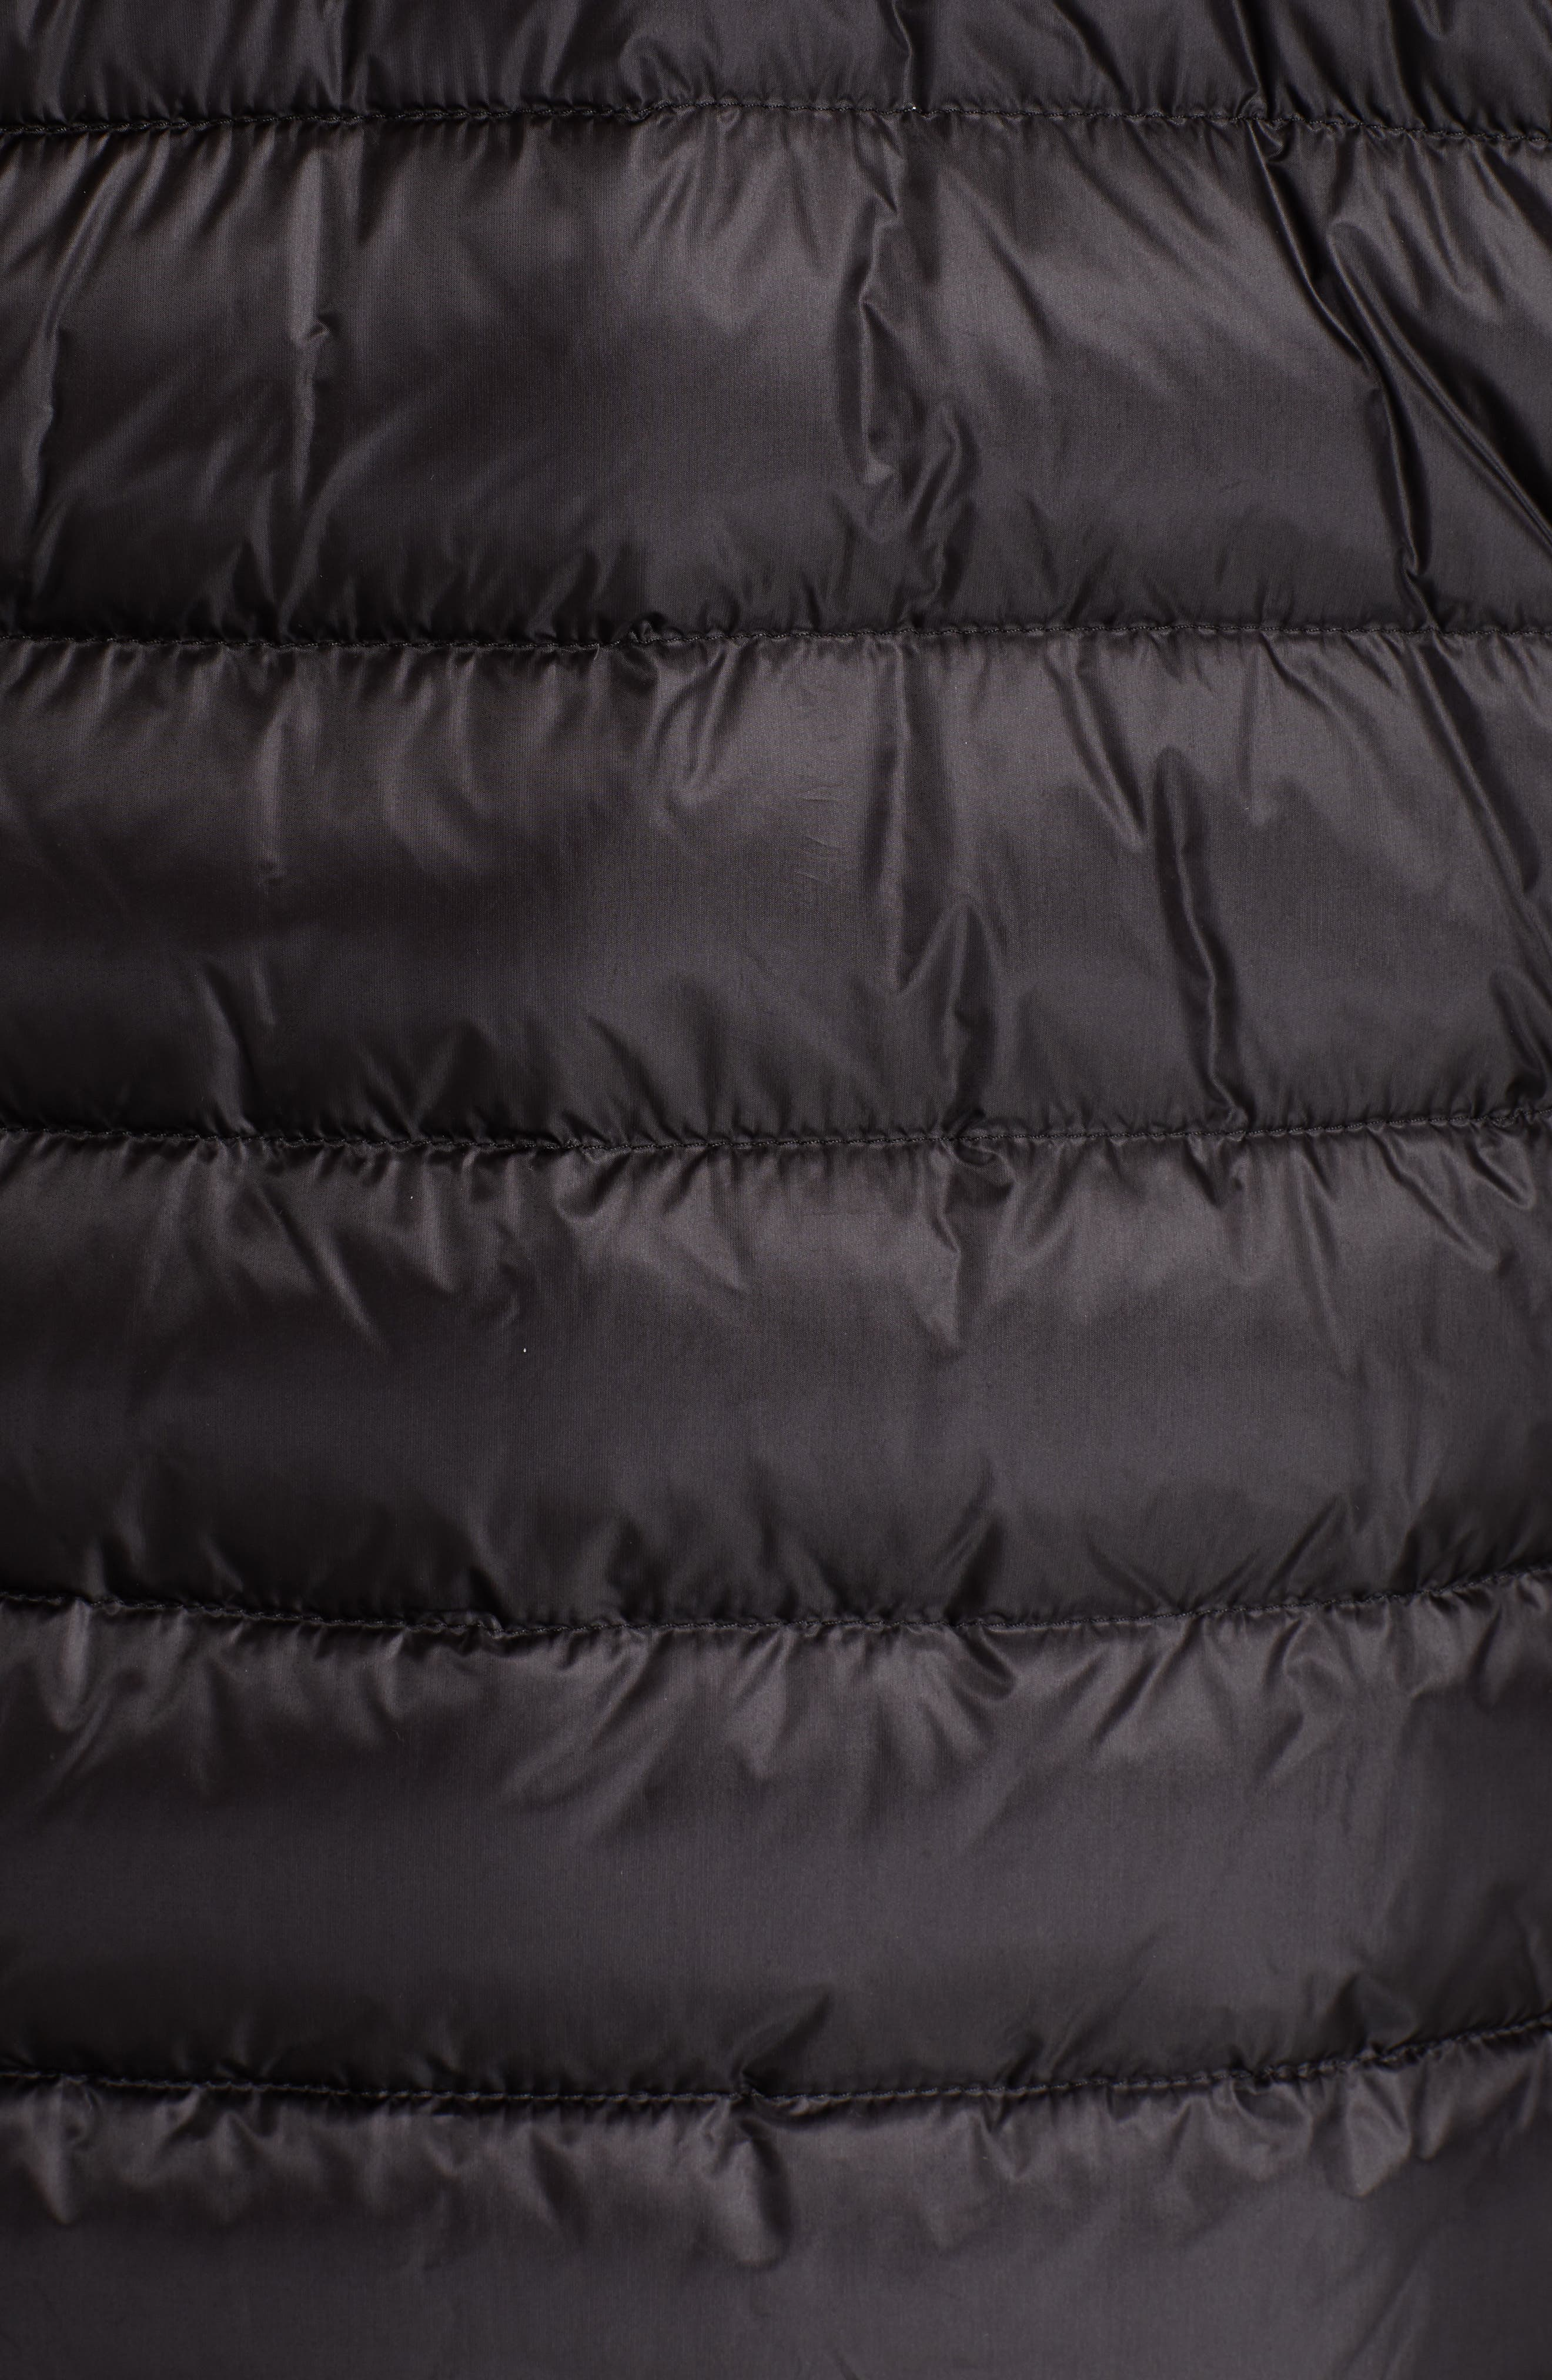 MONCLER, Vasserot Genuine Shearling Collar Jacket, Alternate thumbnail 7, color, BLACK